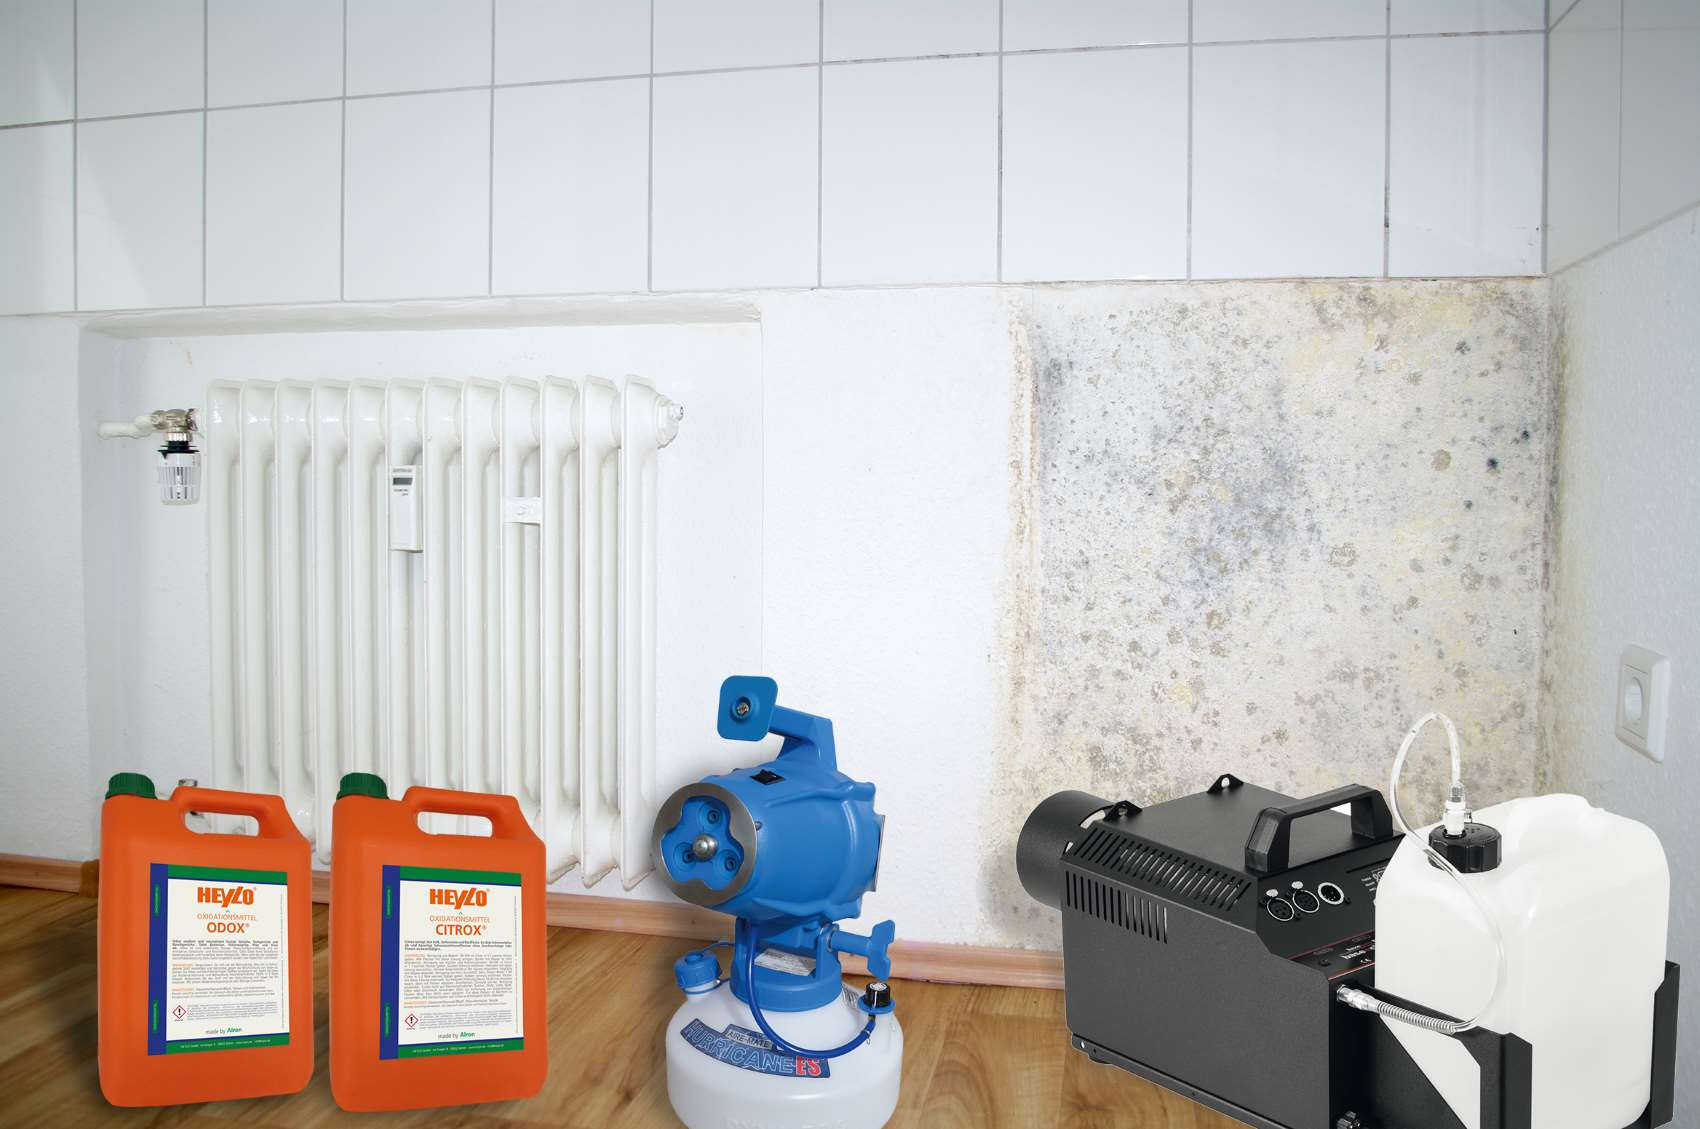 Schimmelpilz_HEYLO_Chemieprodukte